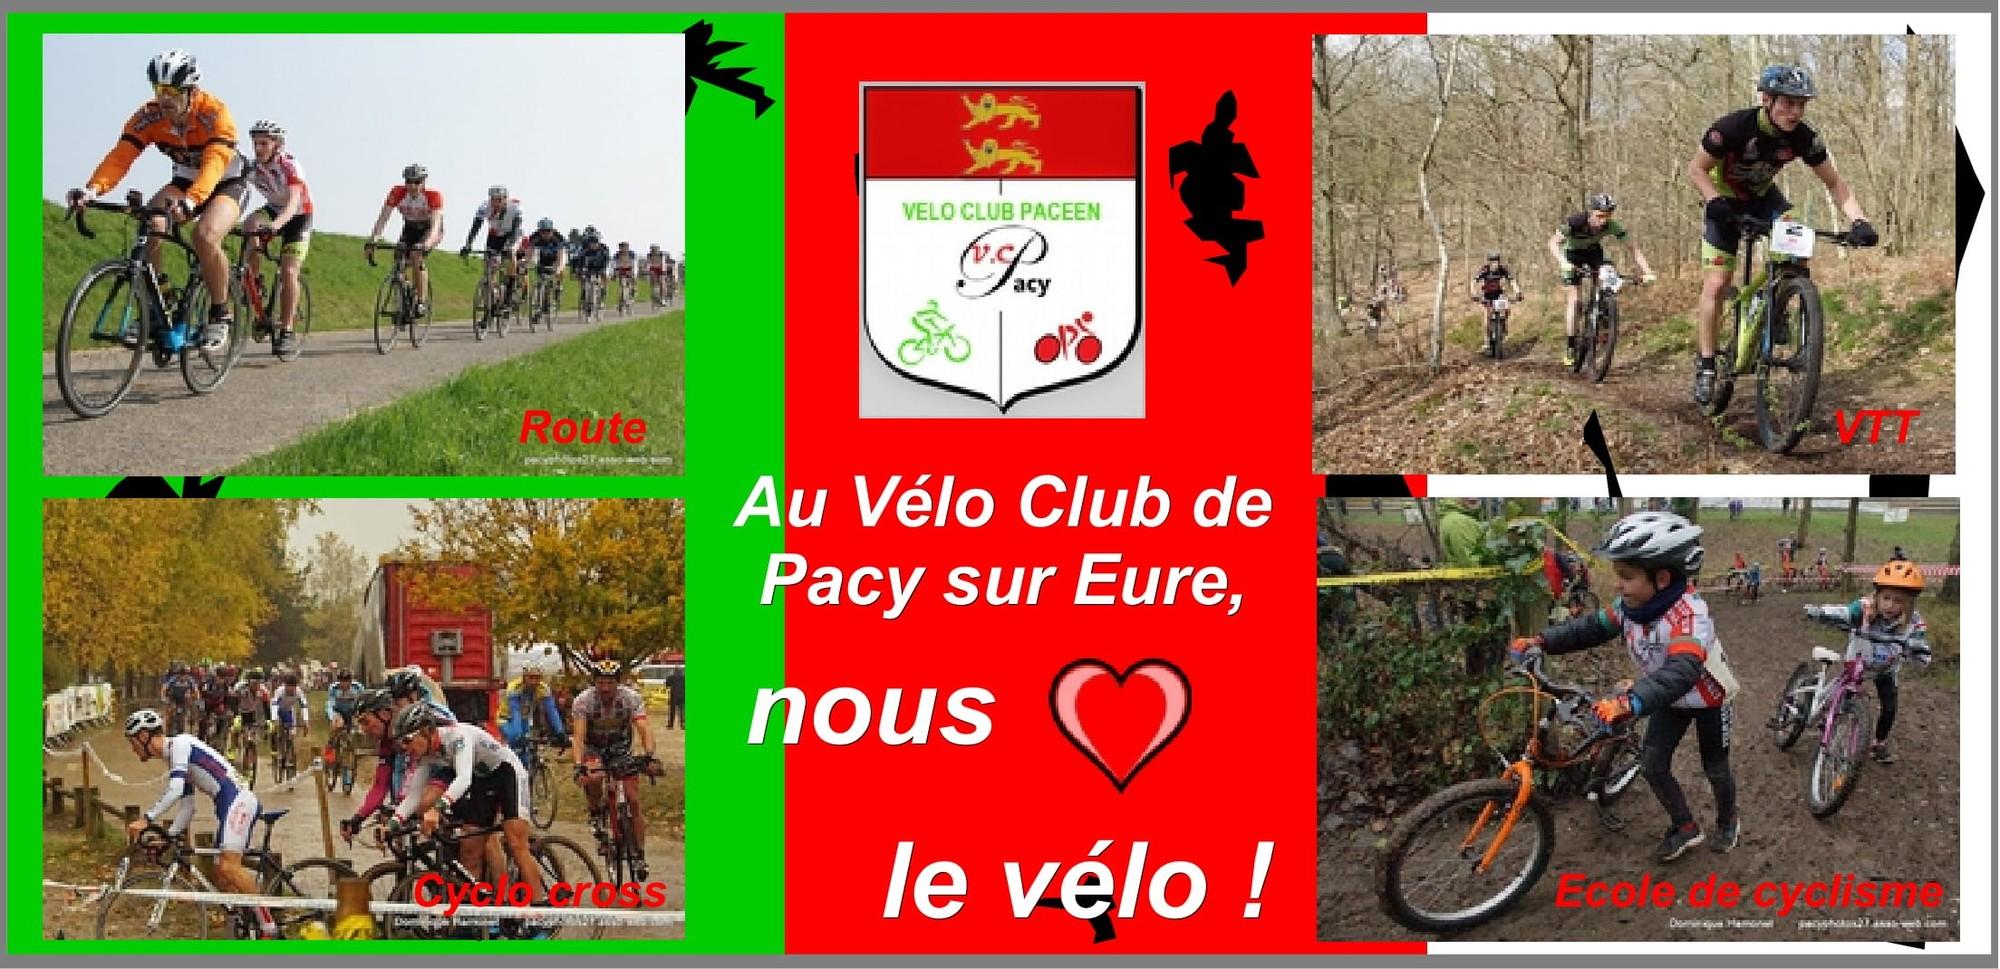 Calendrier Ufolep 2019 Cyclisme.2019 Route Ufolep Eure